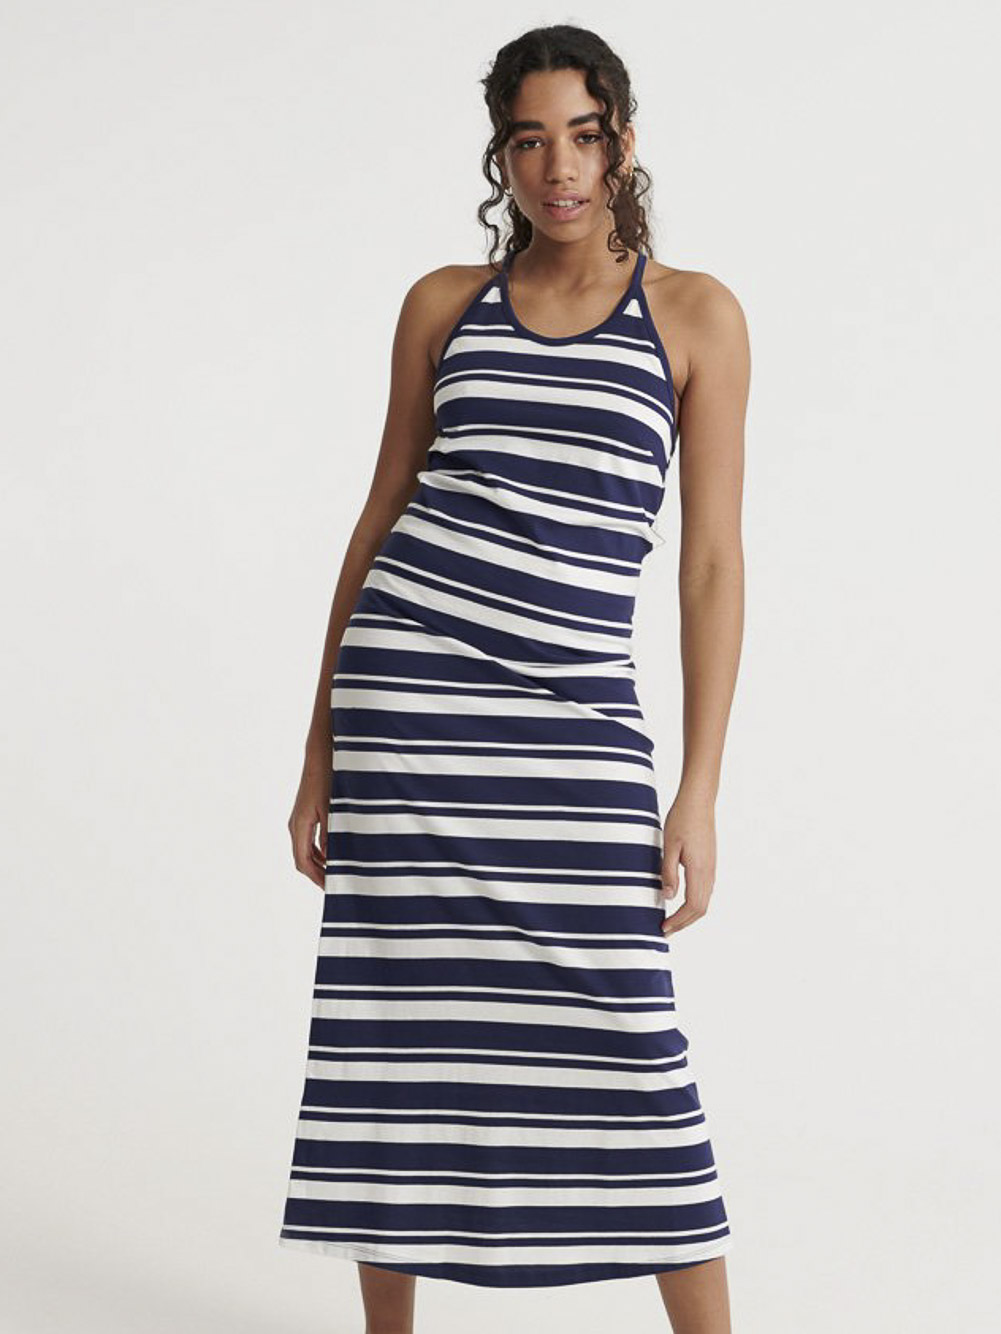 SUPERDRY Φόρεμα αμάνικο W8010132A-GKV ΡΙΓΕ ΜΠΛΕ